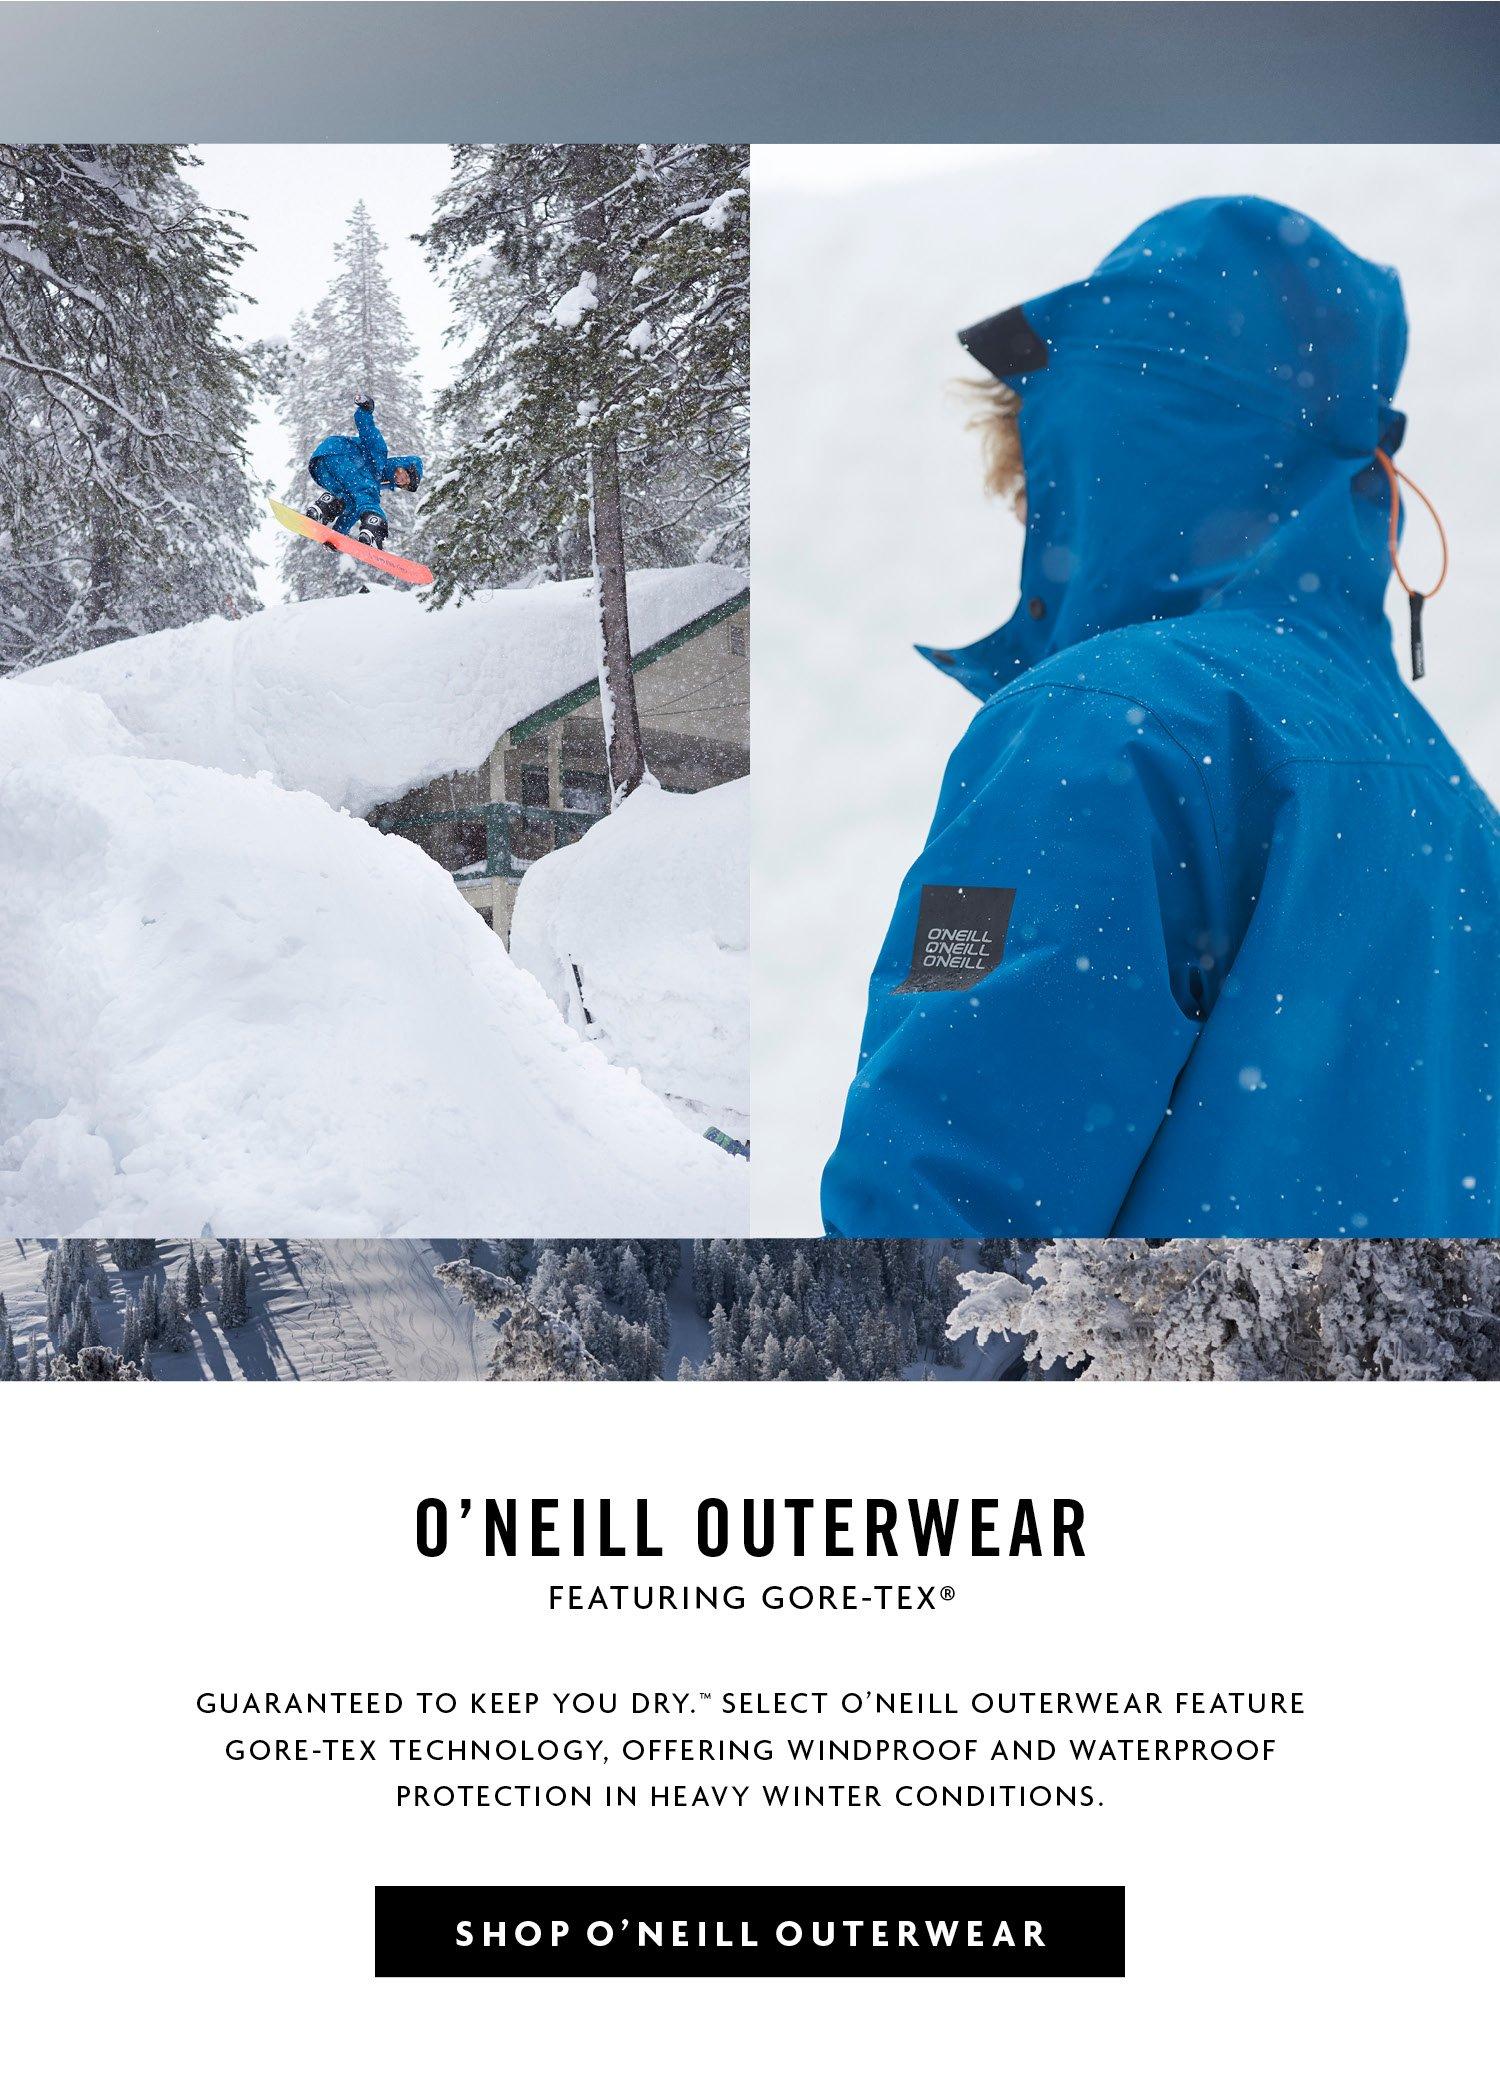 Gore-Tex® Outerwear